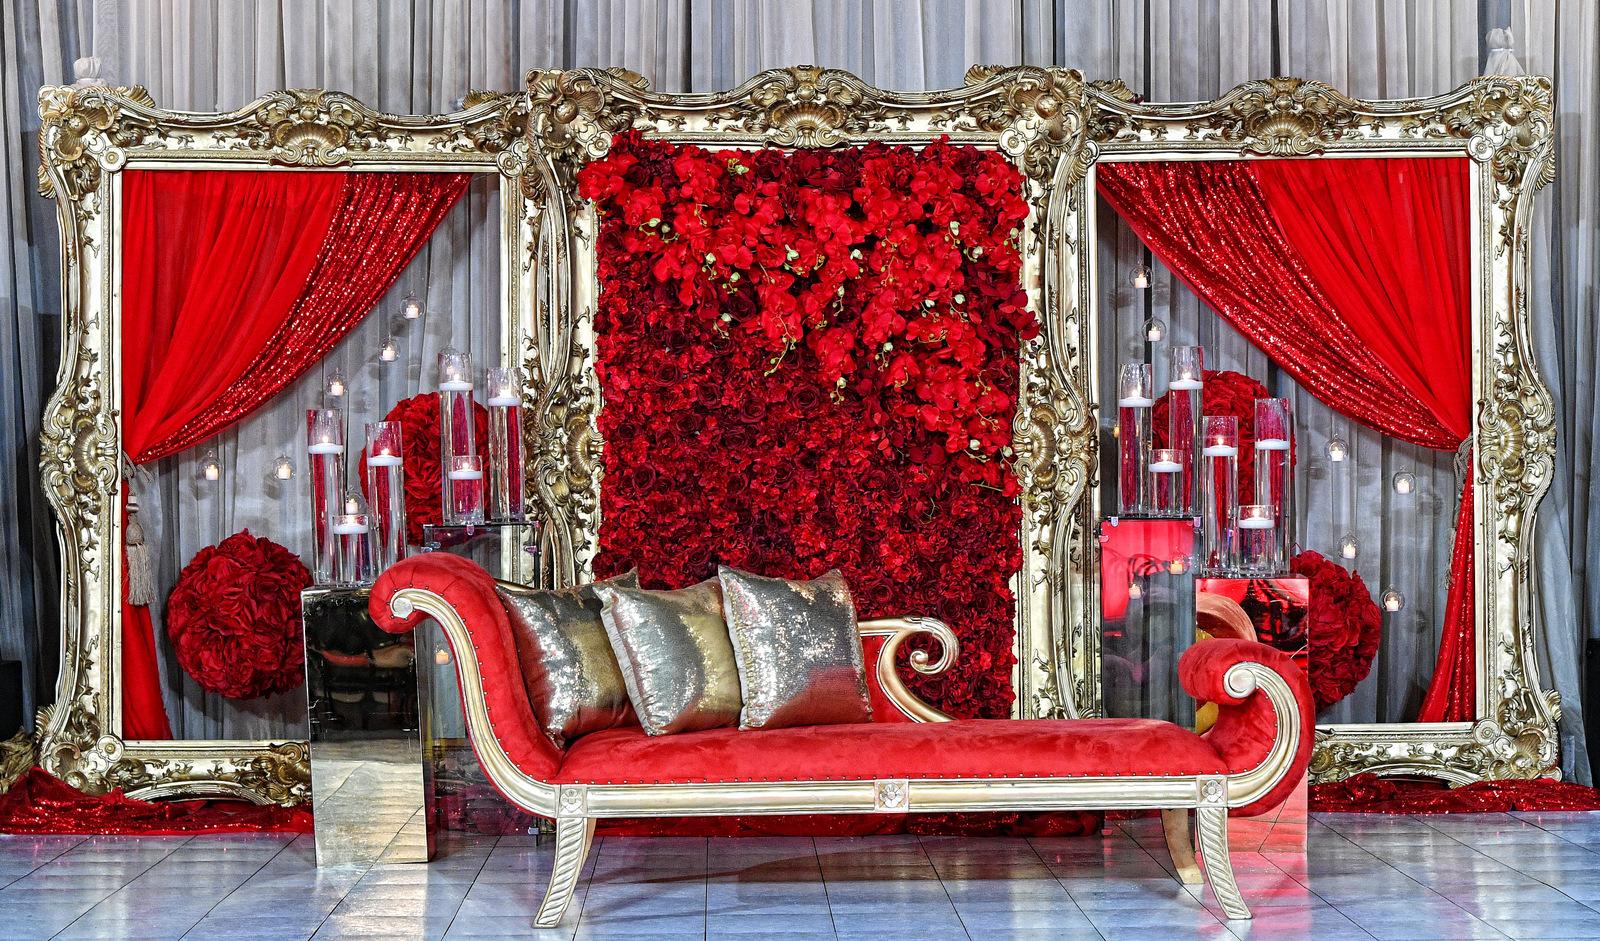 houston-weddings-manjot-karanjit-11.jpg